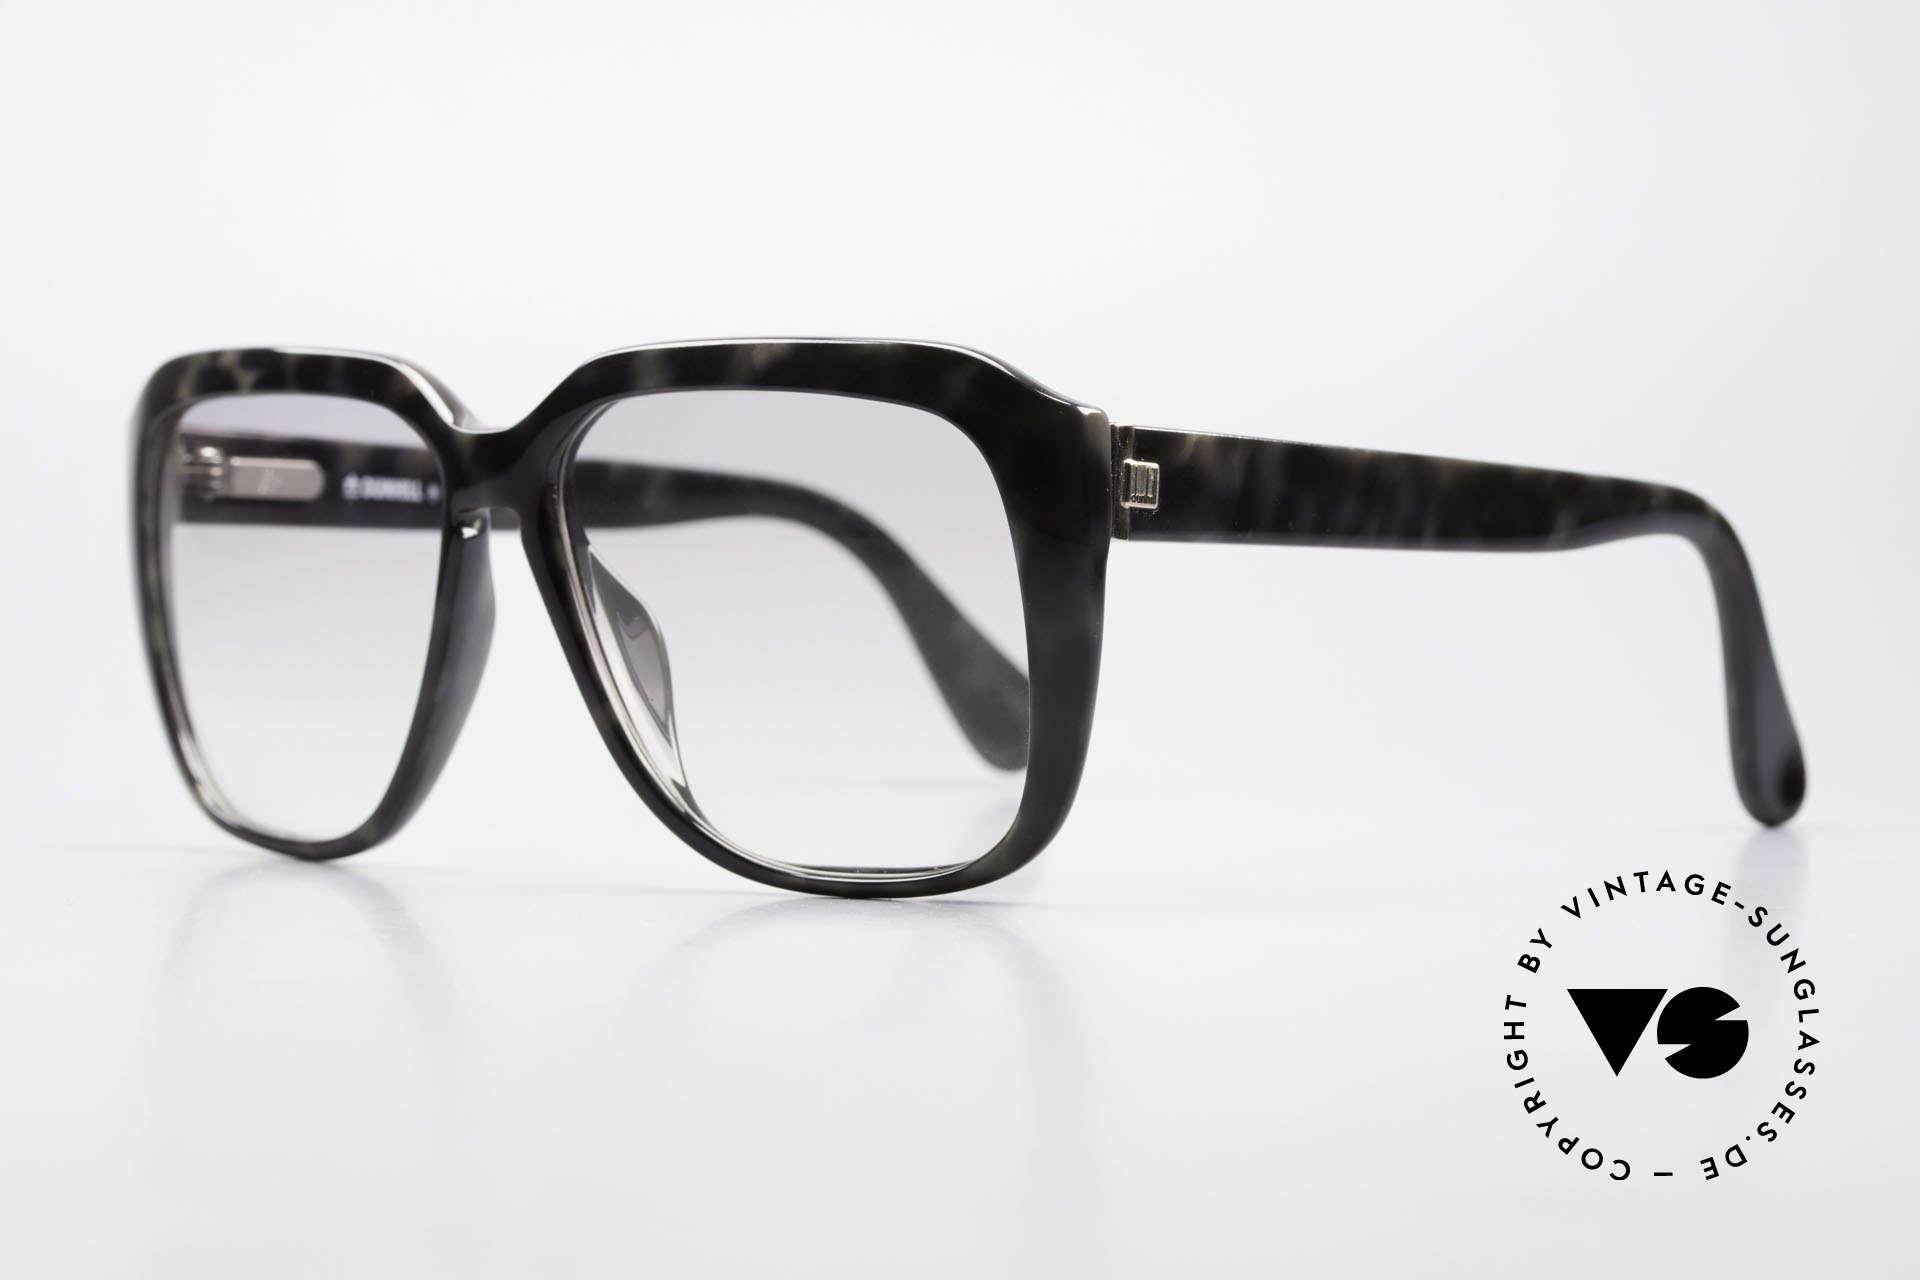 Dunhill 6045 80's Optyl Sunglasses For Men, still lightweight thanks to ingenious OPTYL material, Made for Men